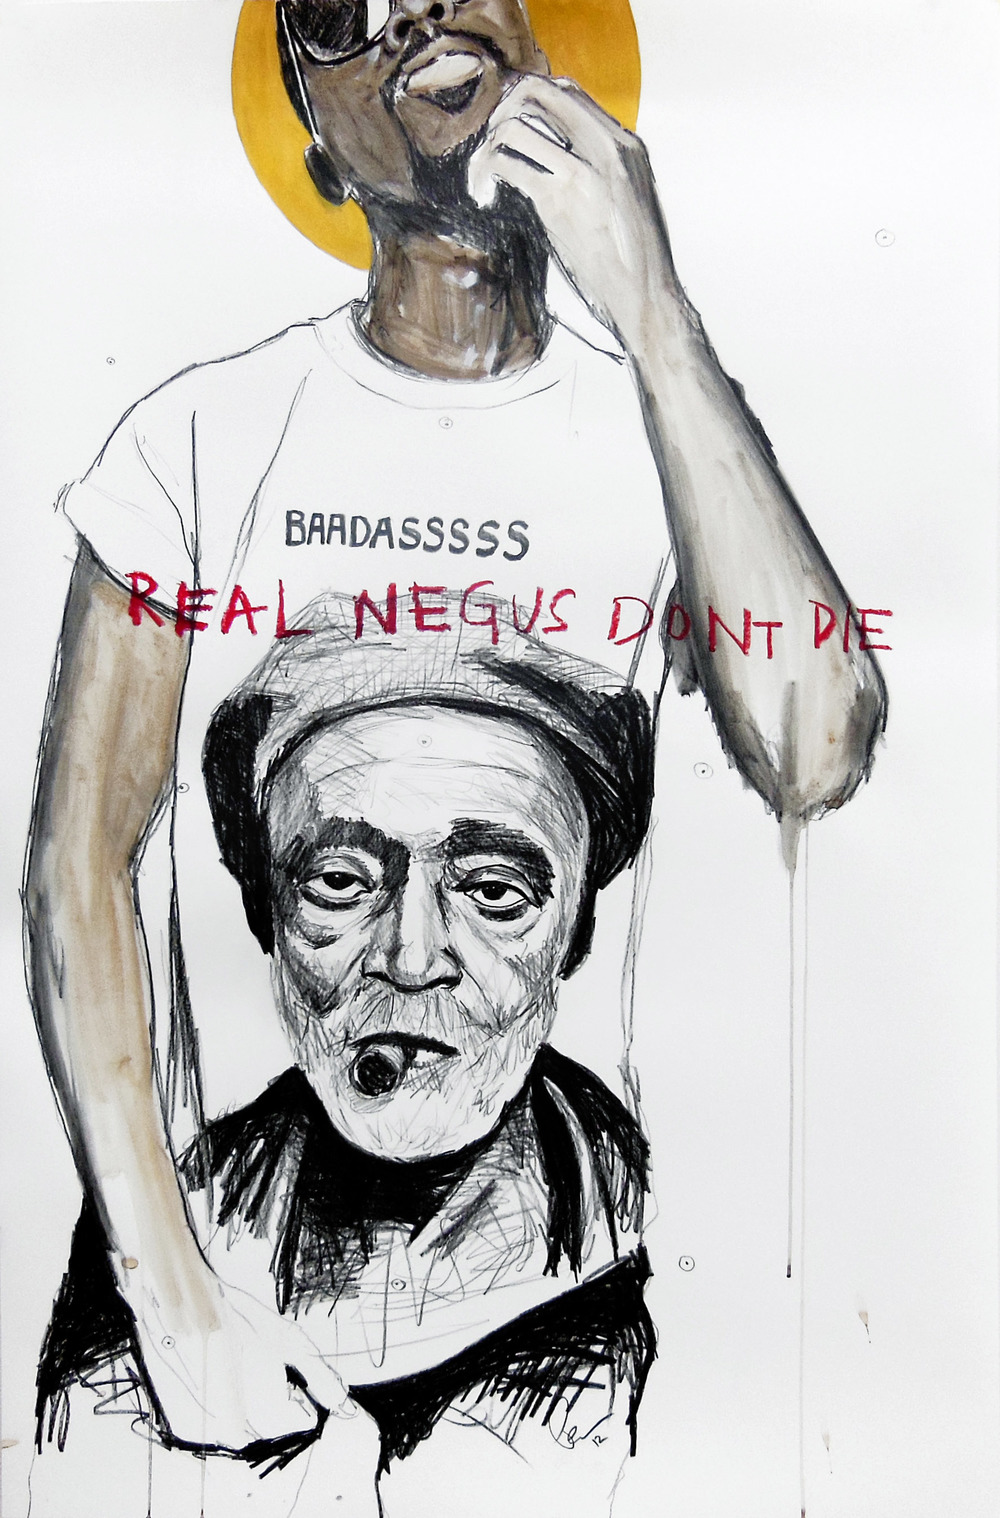 Real NEGUS don't die: Baadasssss, 2012